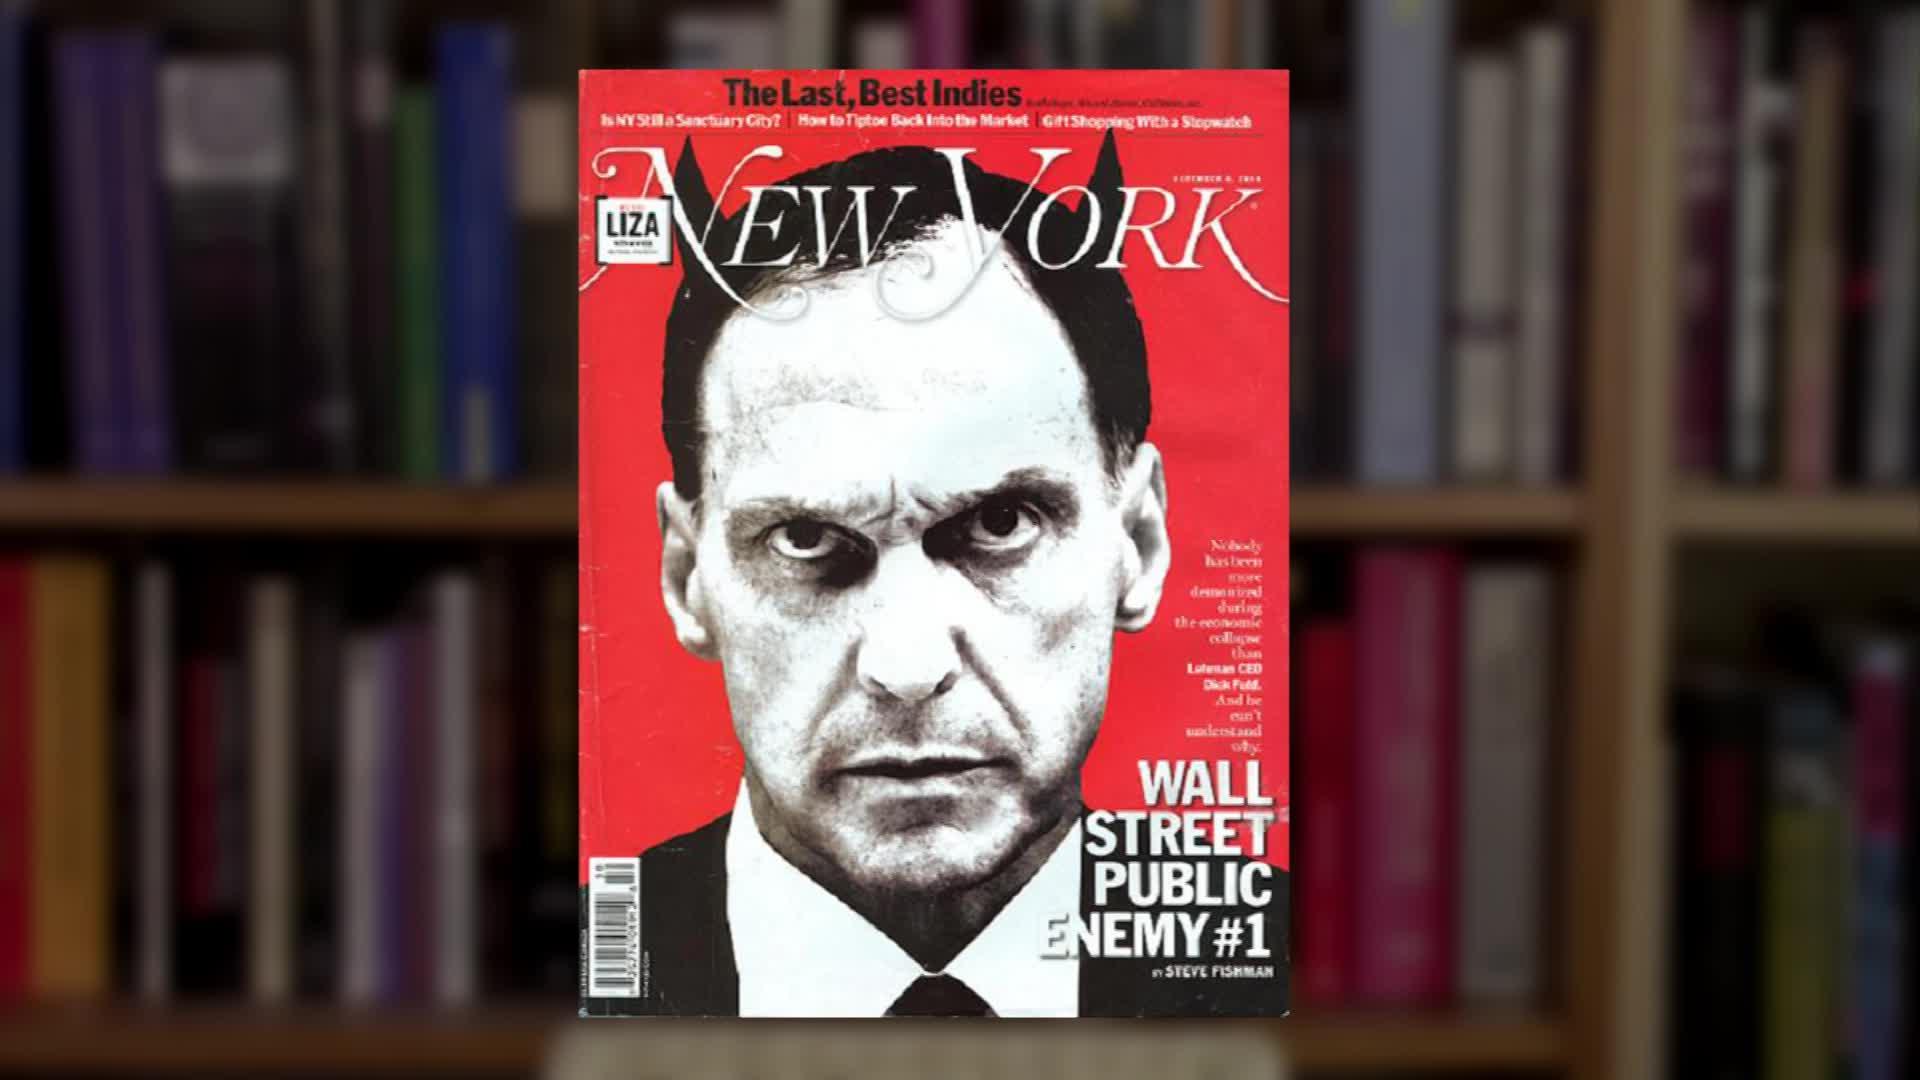 Dick Fuld - Titelseite Zeitschrift New York - Teufelshörner